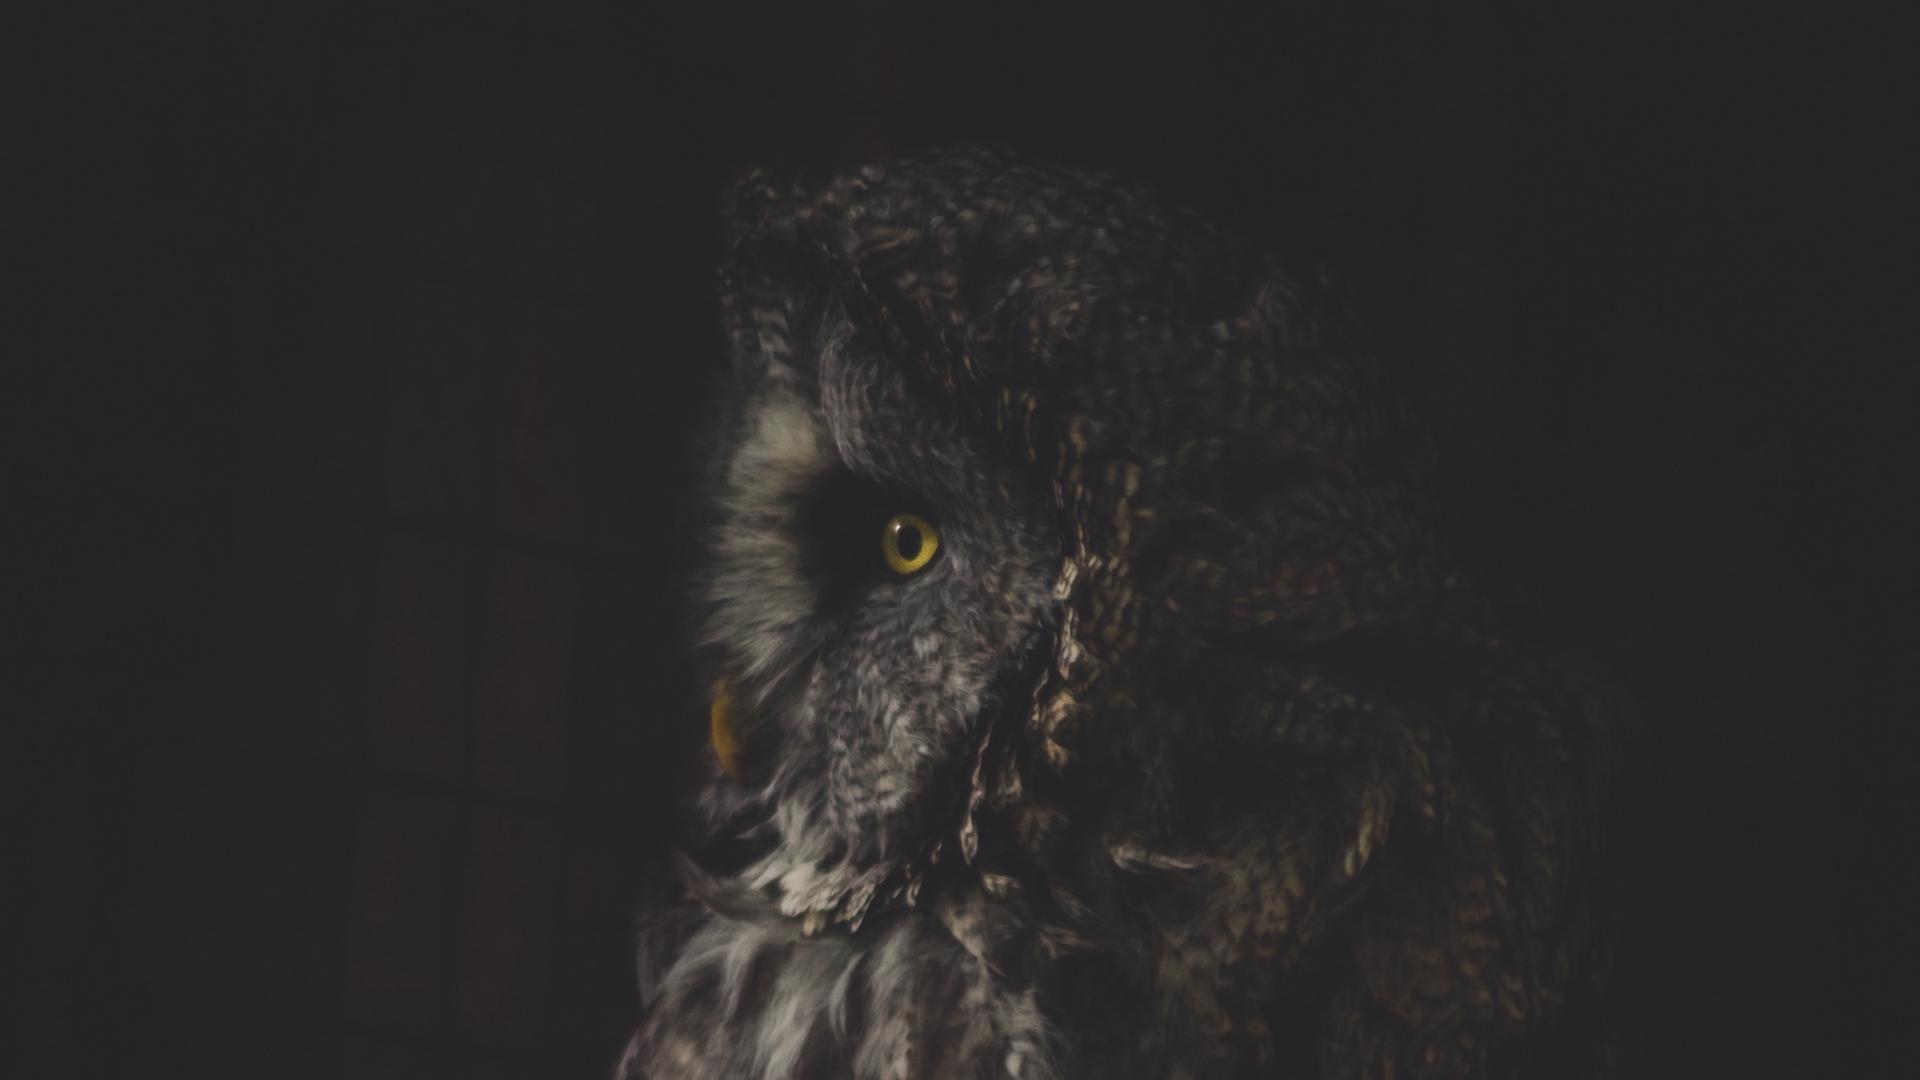 Wallpaper Owl Bird Dark Predator Looks Turned Owl Dark 1920x1080 Wallpaper Teahub Io